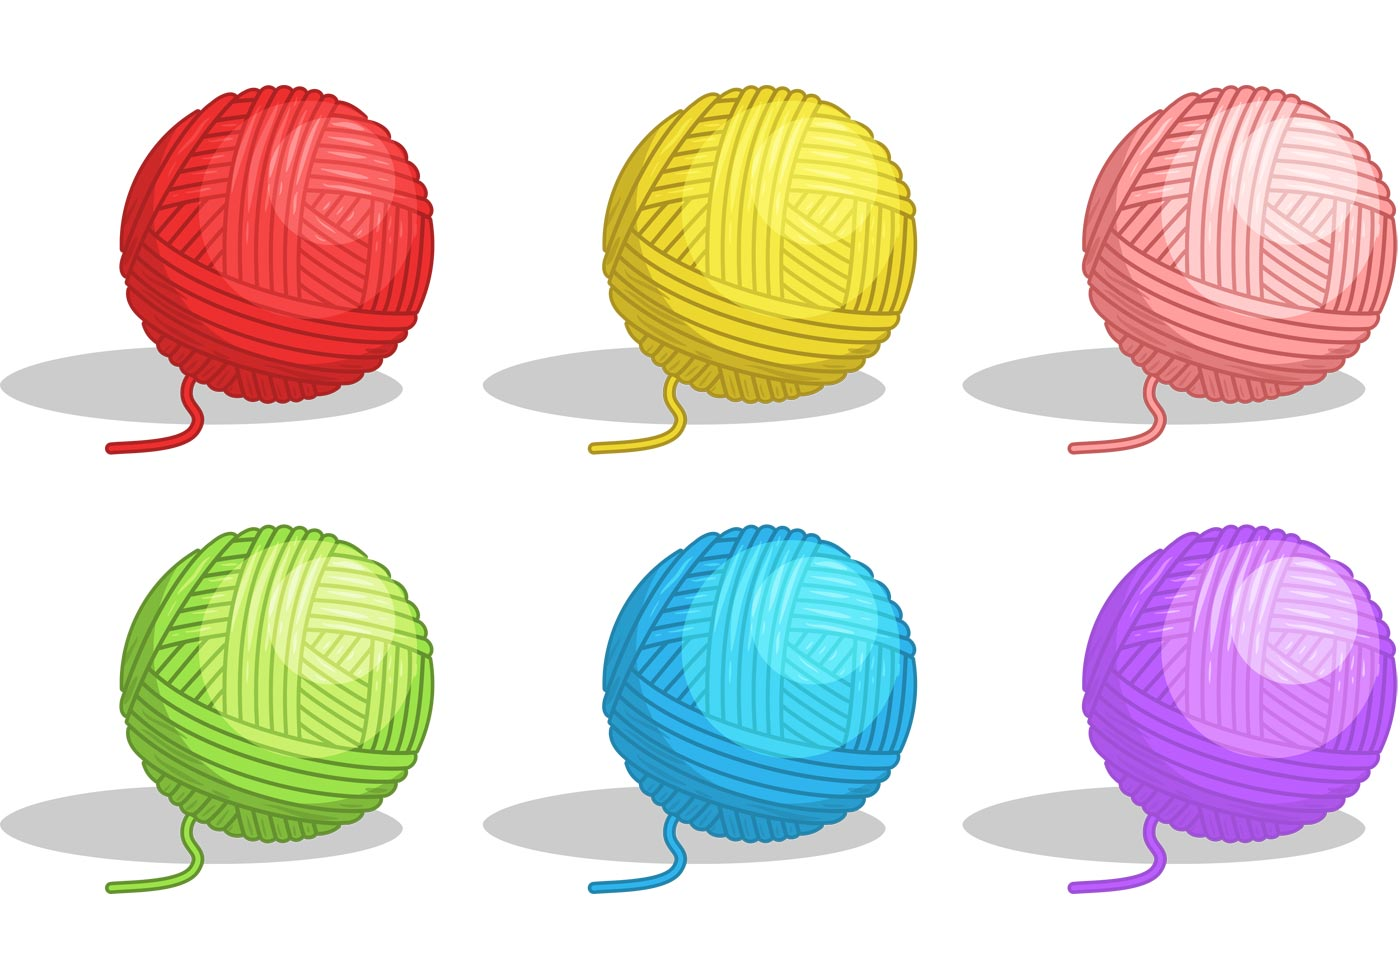 Ball of yarn vectors download free vector art stock - Ball image download ...